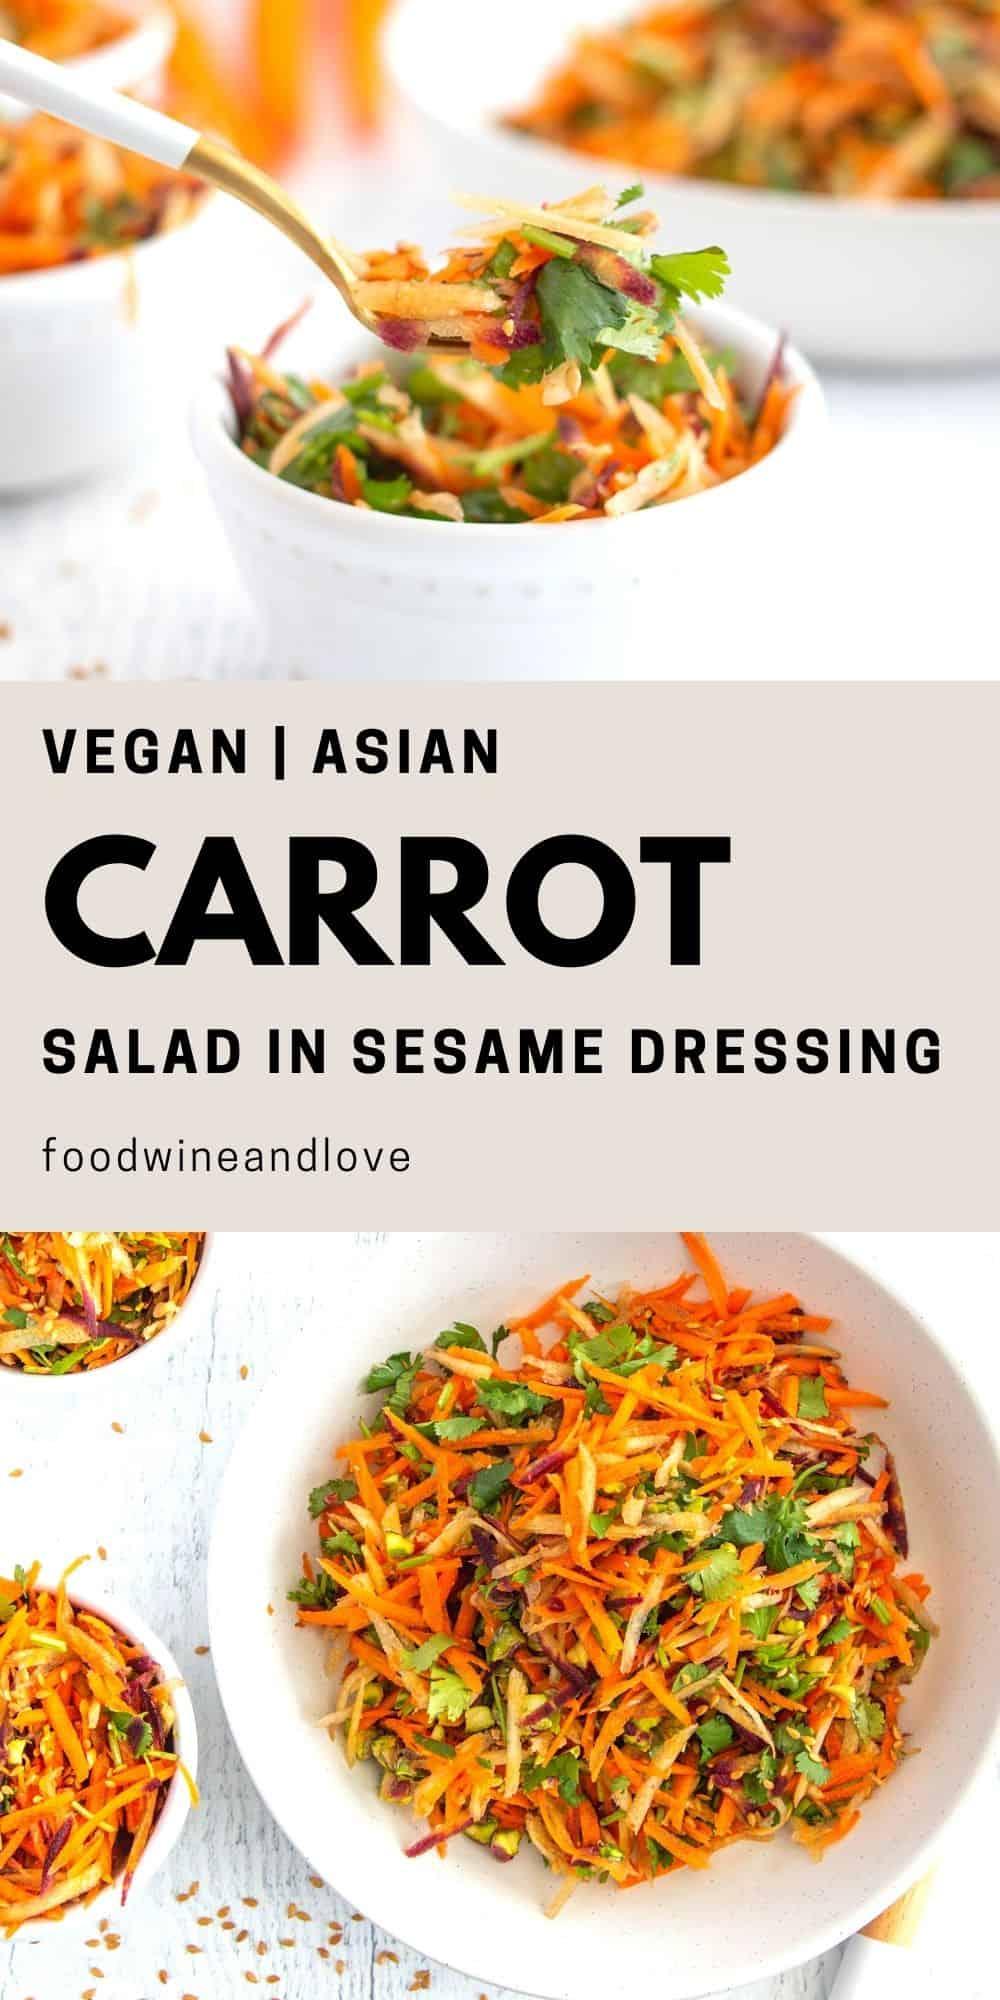 Asian Carrot Salad in Sesame Dressing